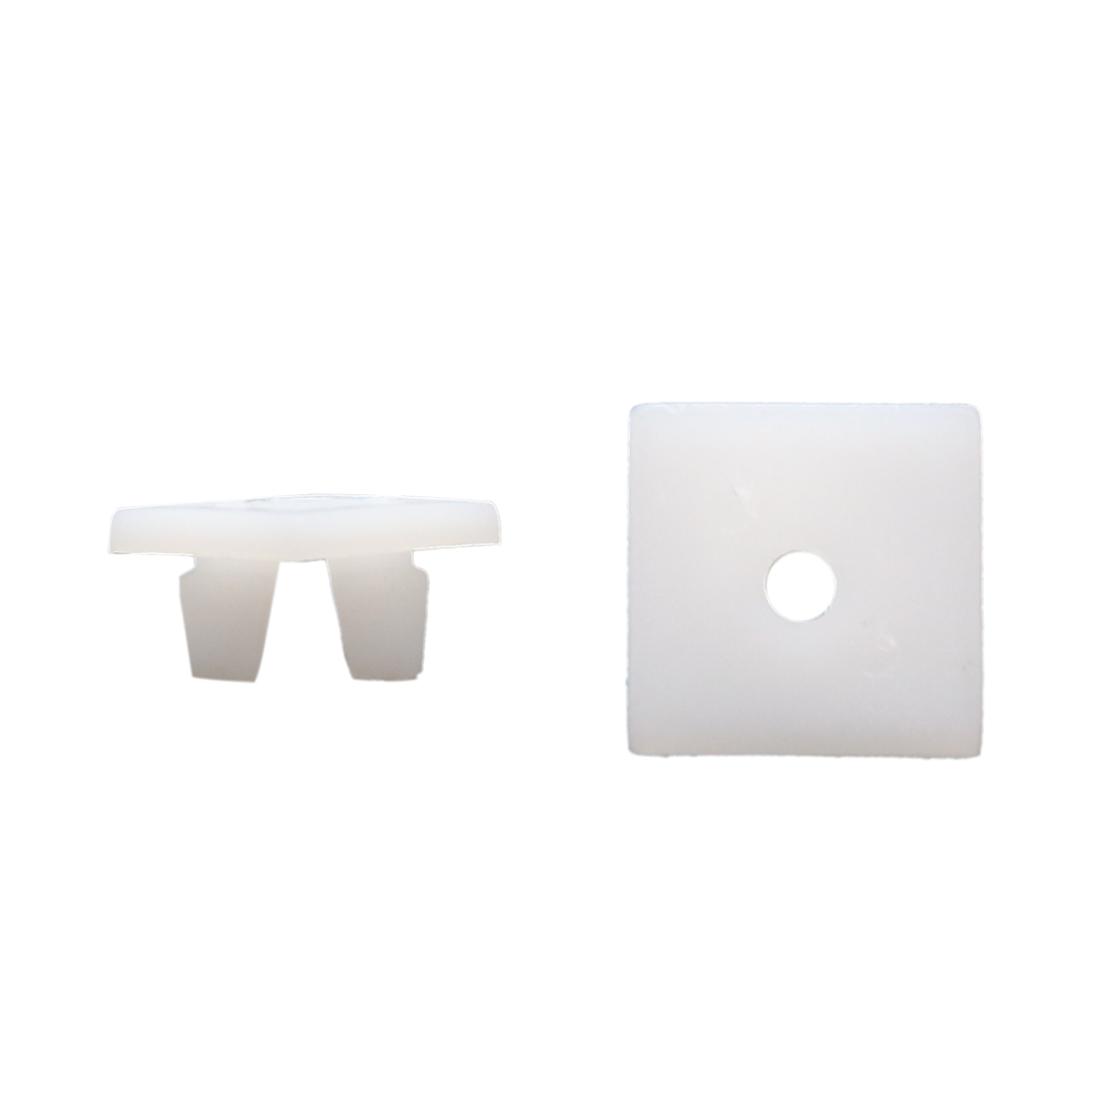 30pcs 13mm Car Plastic Push Type Rivet Retainer Fastener Bumper Pin Clips White